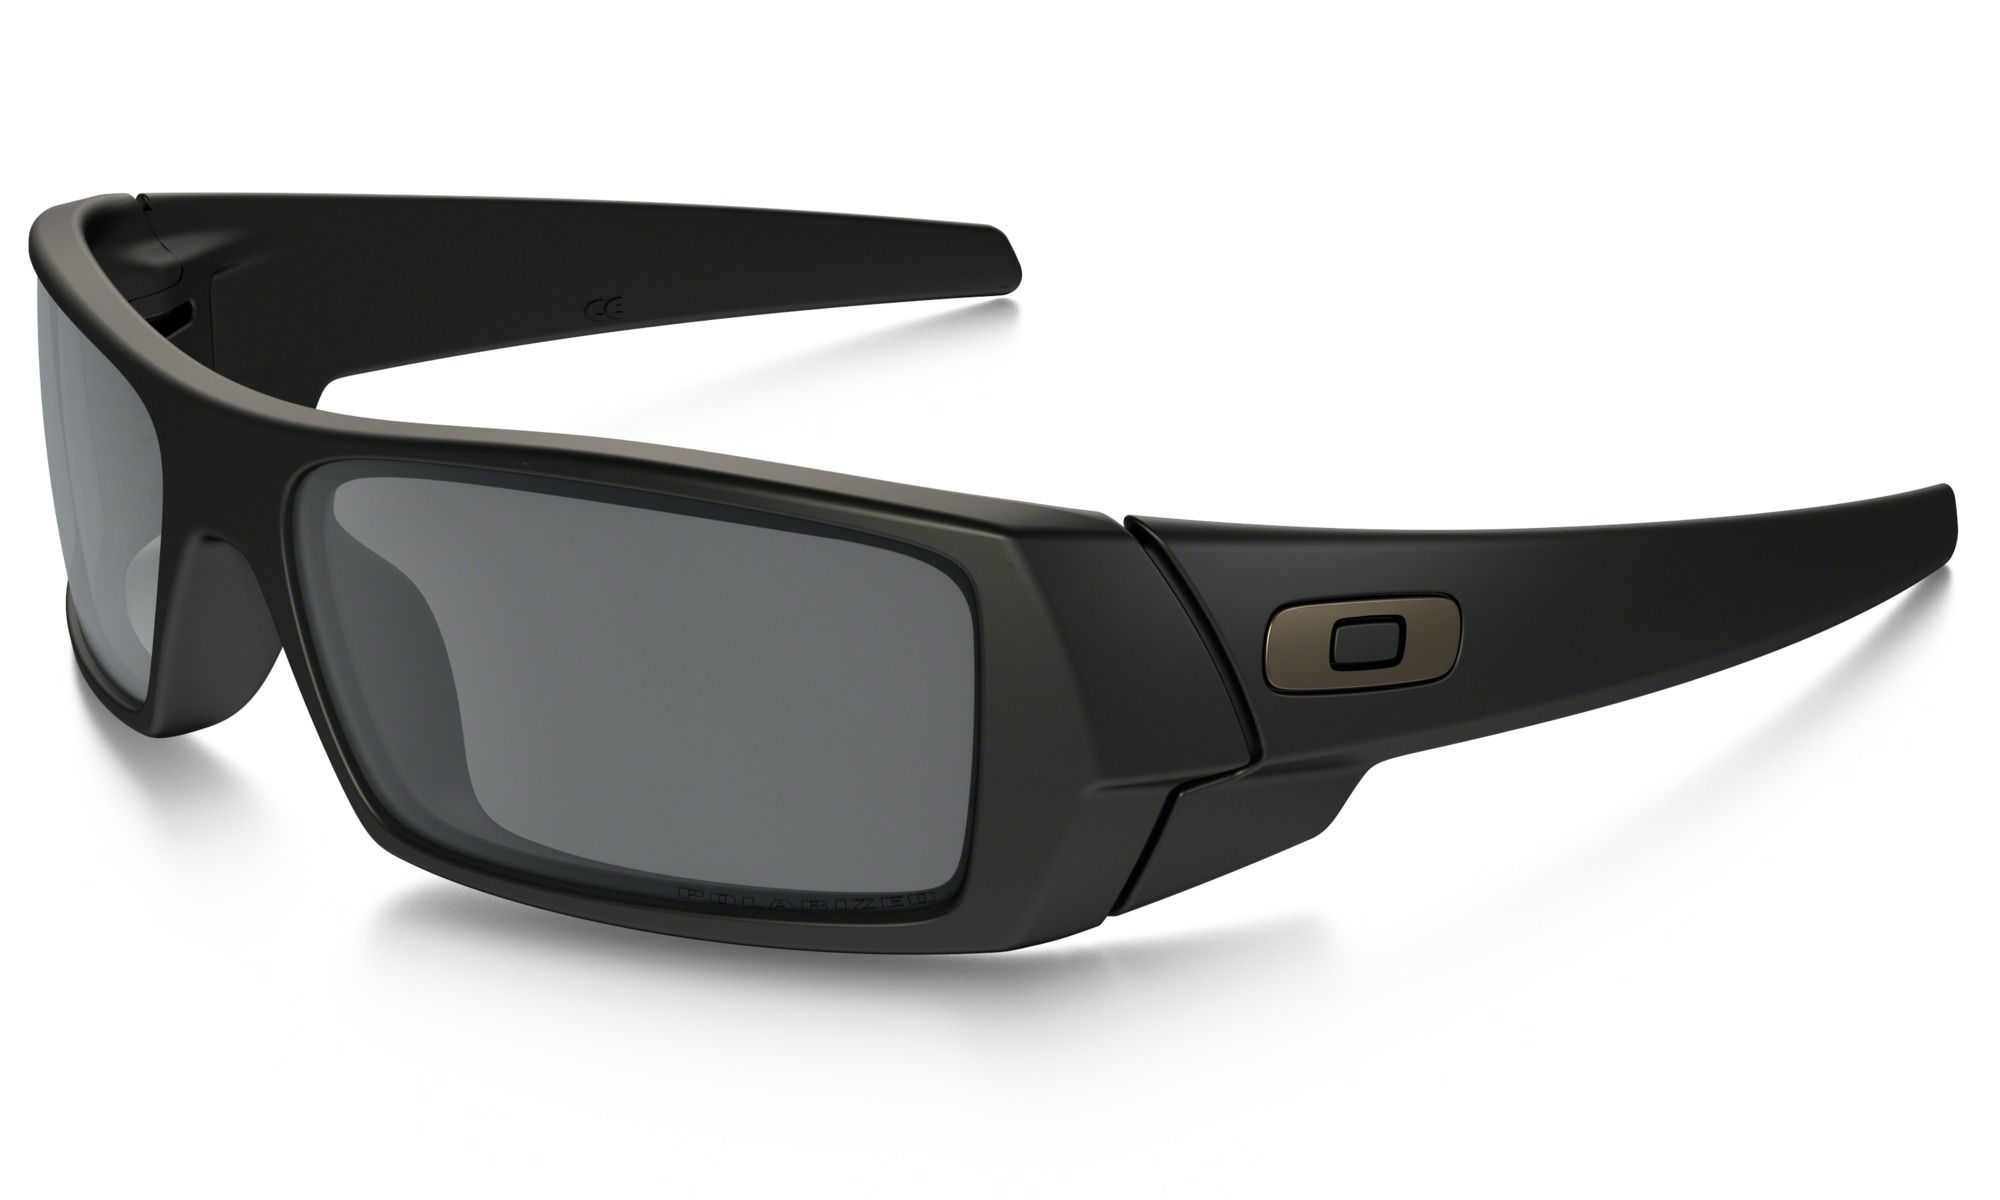 Sunglasses, Goggles & Apparel for Men and Women | Kayak